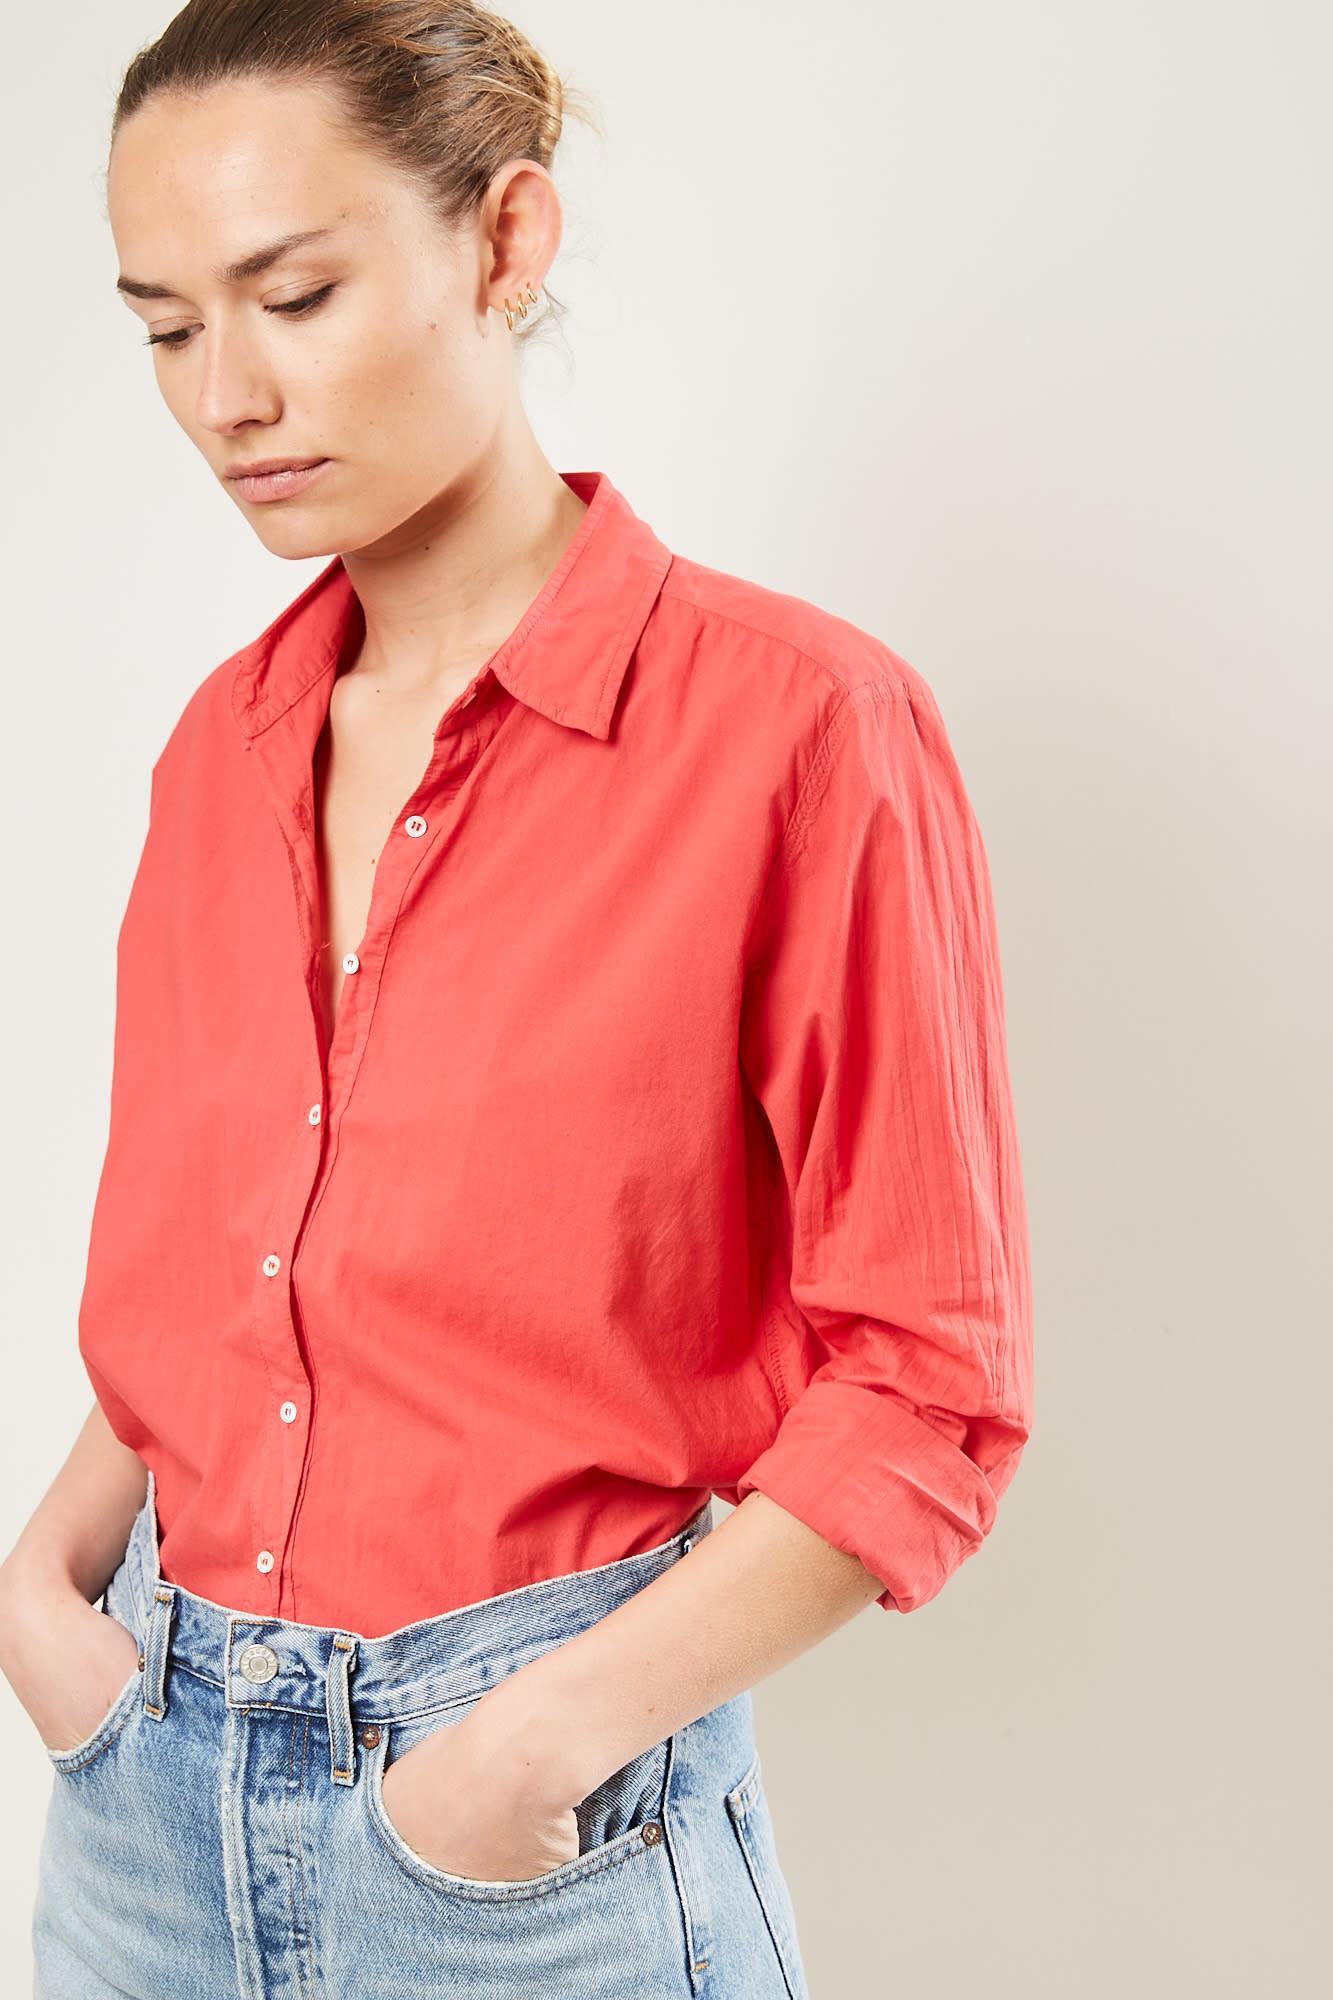 Xirena Beau cotton poplin shirt old flame